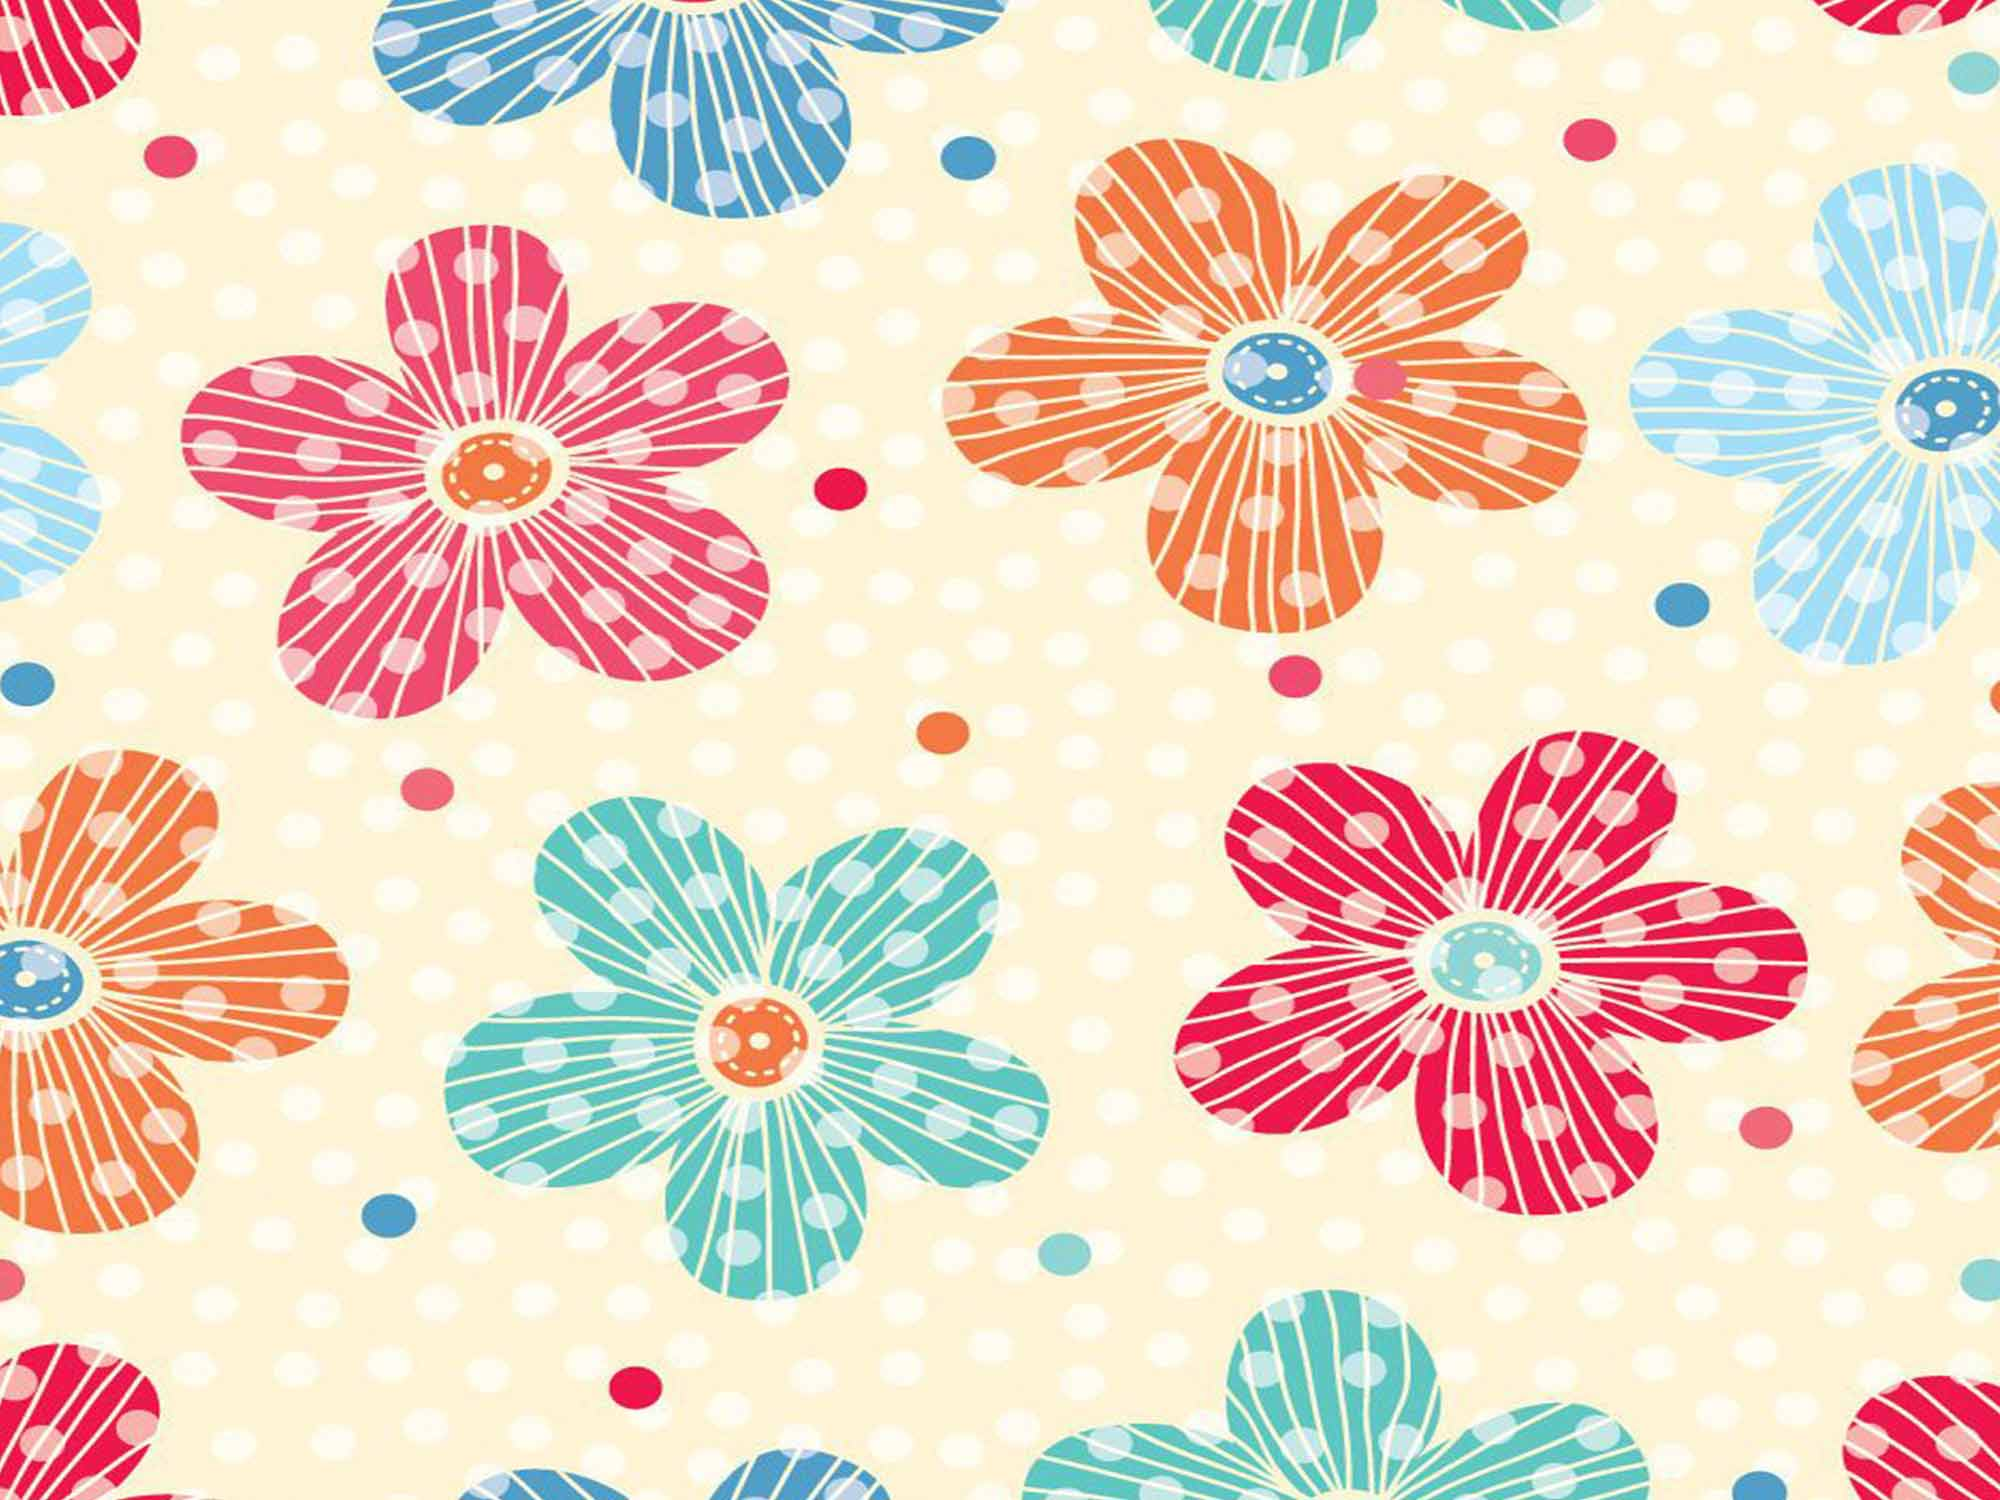 Papel de Parede Floral 0107 - Adesivos de Parede  - Paredes Decoradas